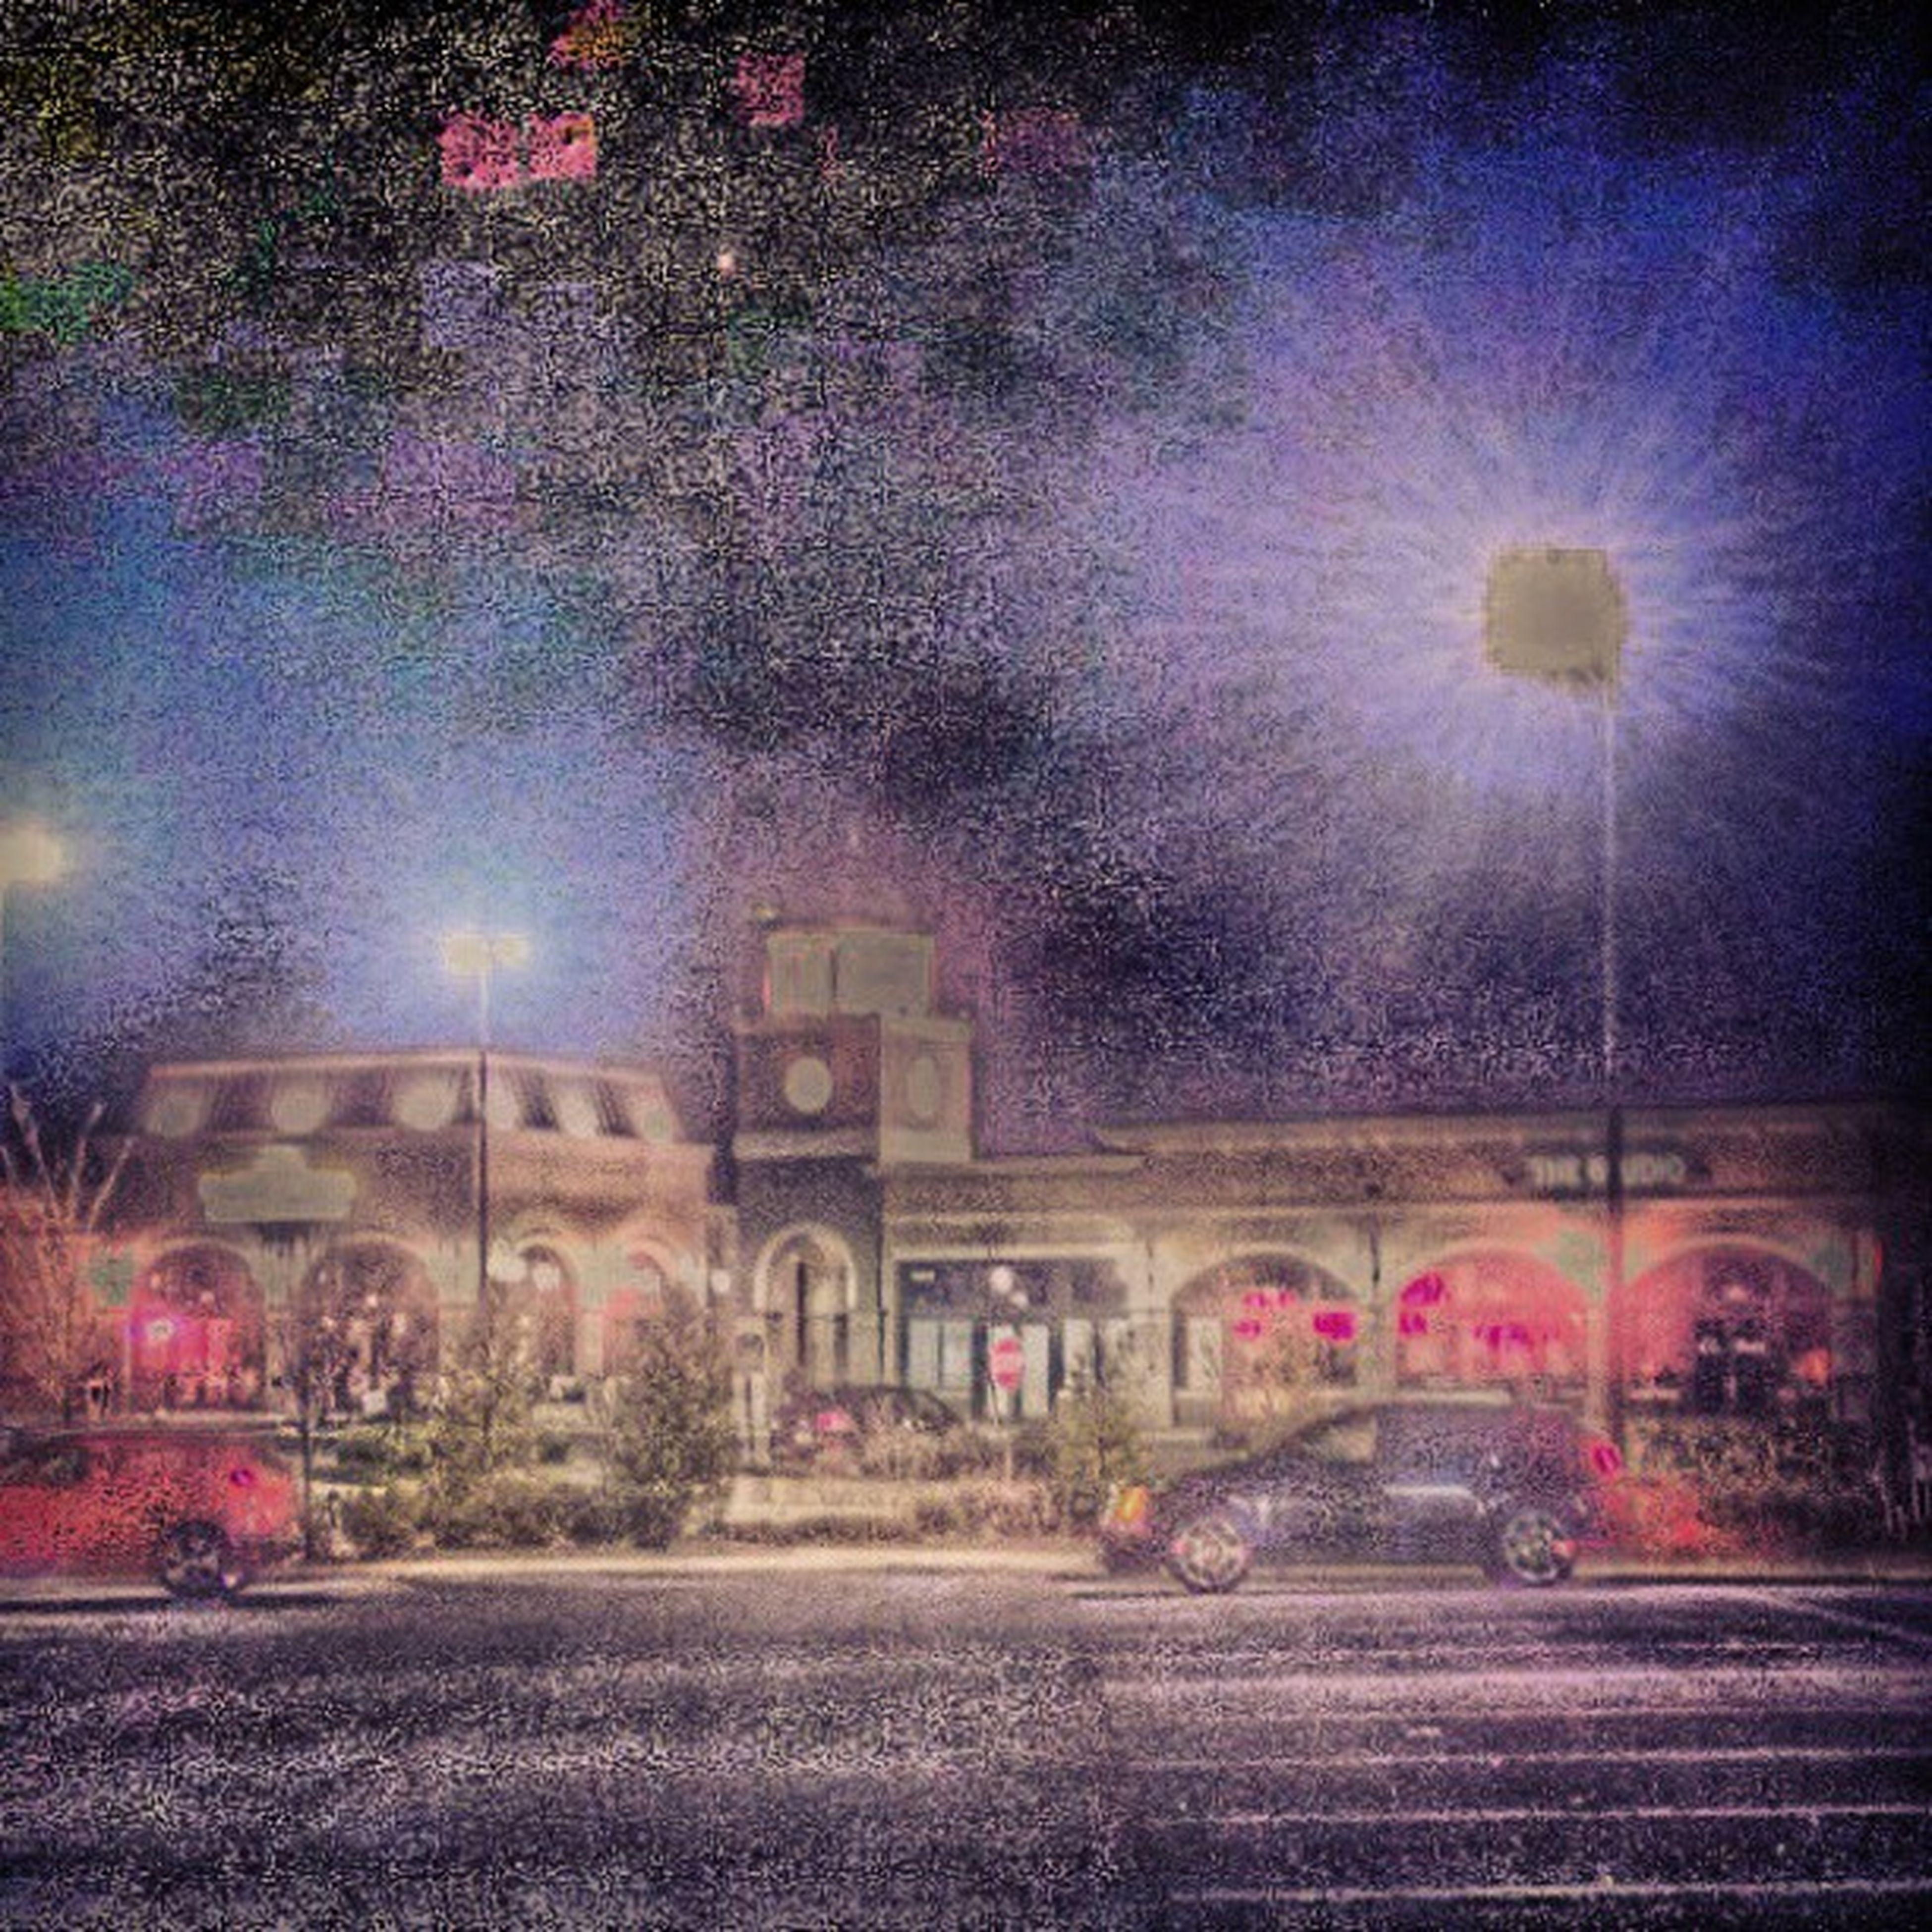 Goose Creek Plaza at Night